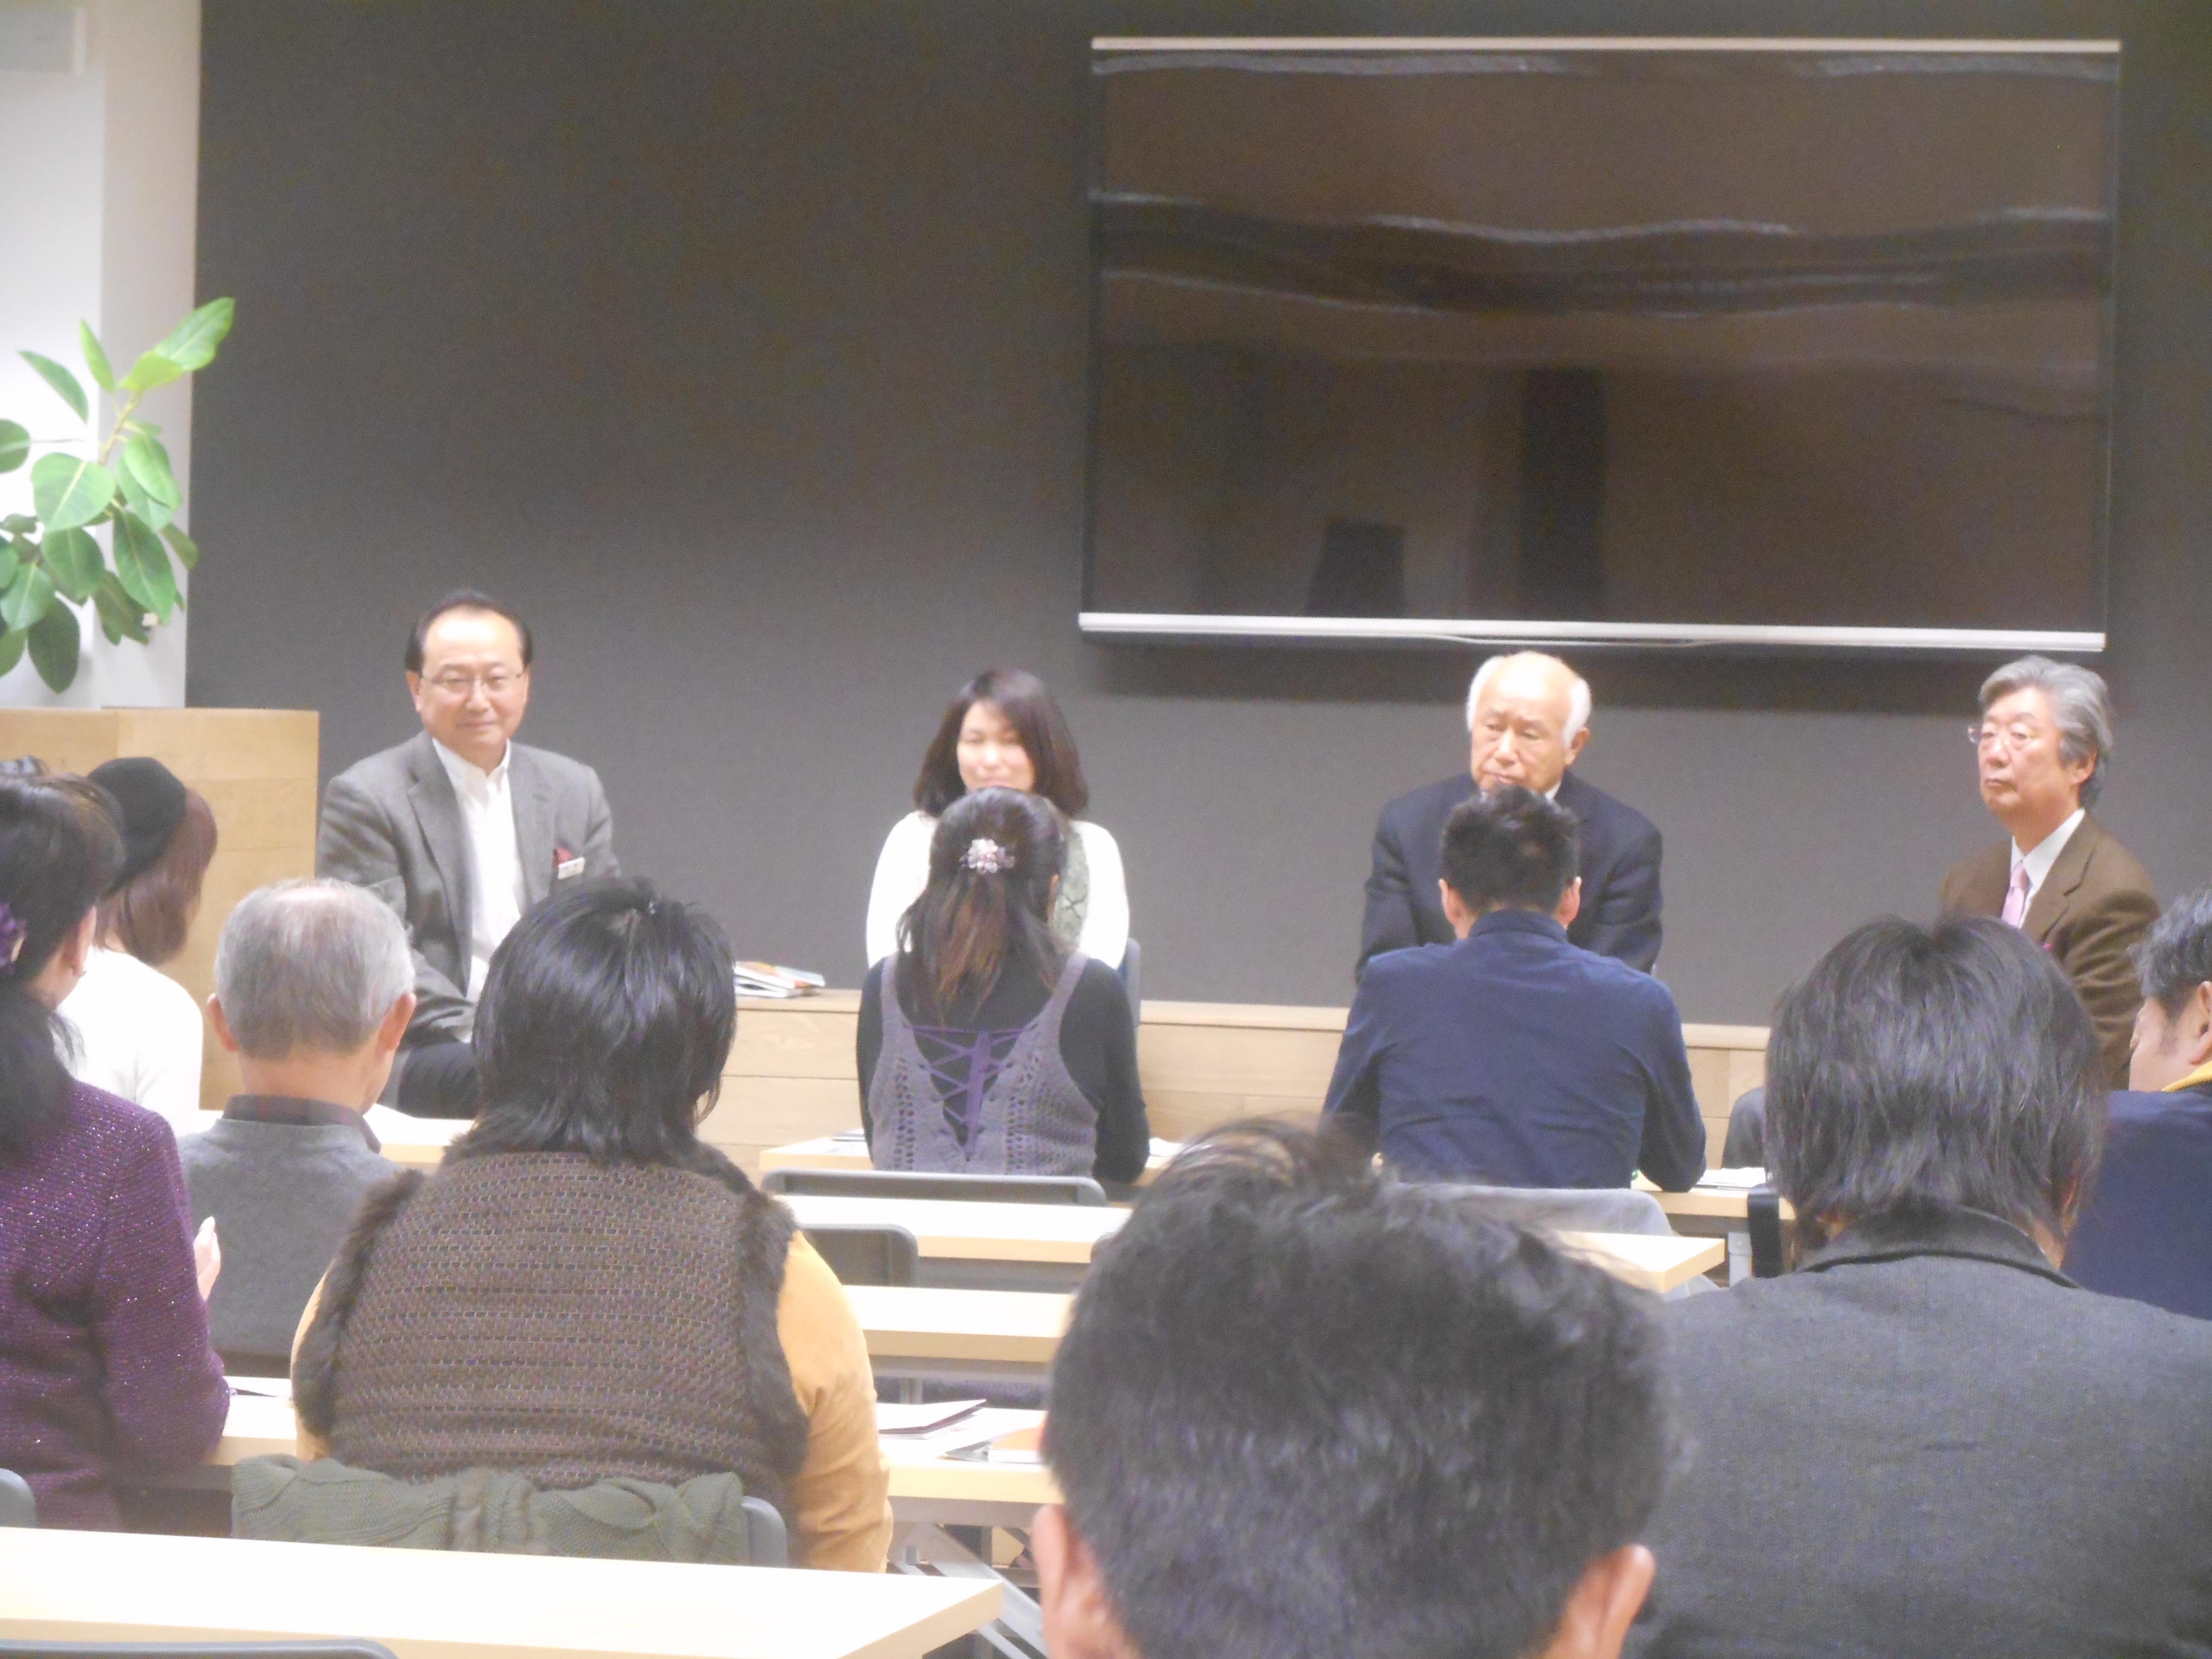 DSCN0510 - 平成30年度 東京思風塾 4月7日(土)「時代が問題をつくり、問題が人物をつくる」